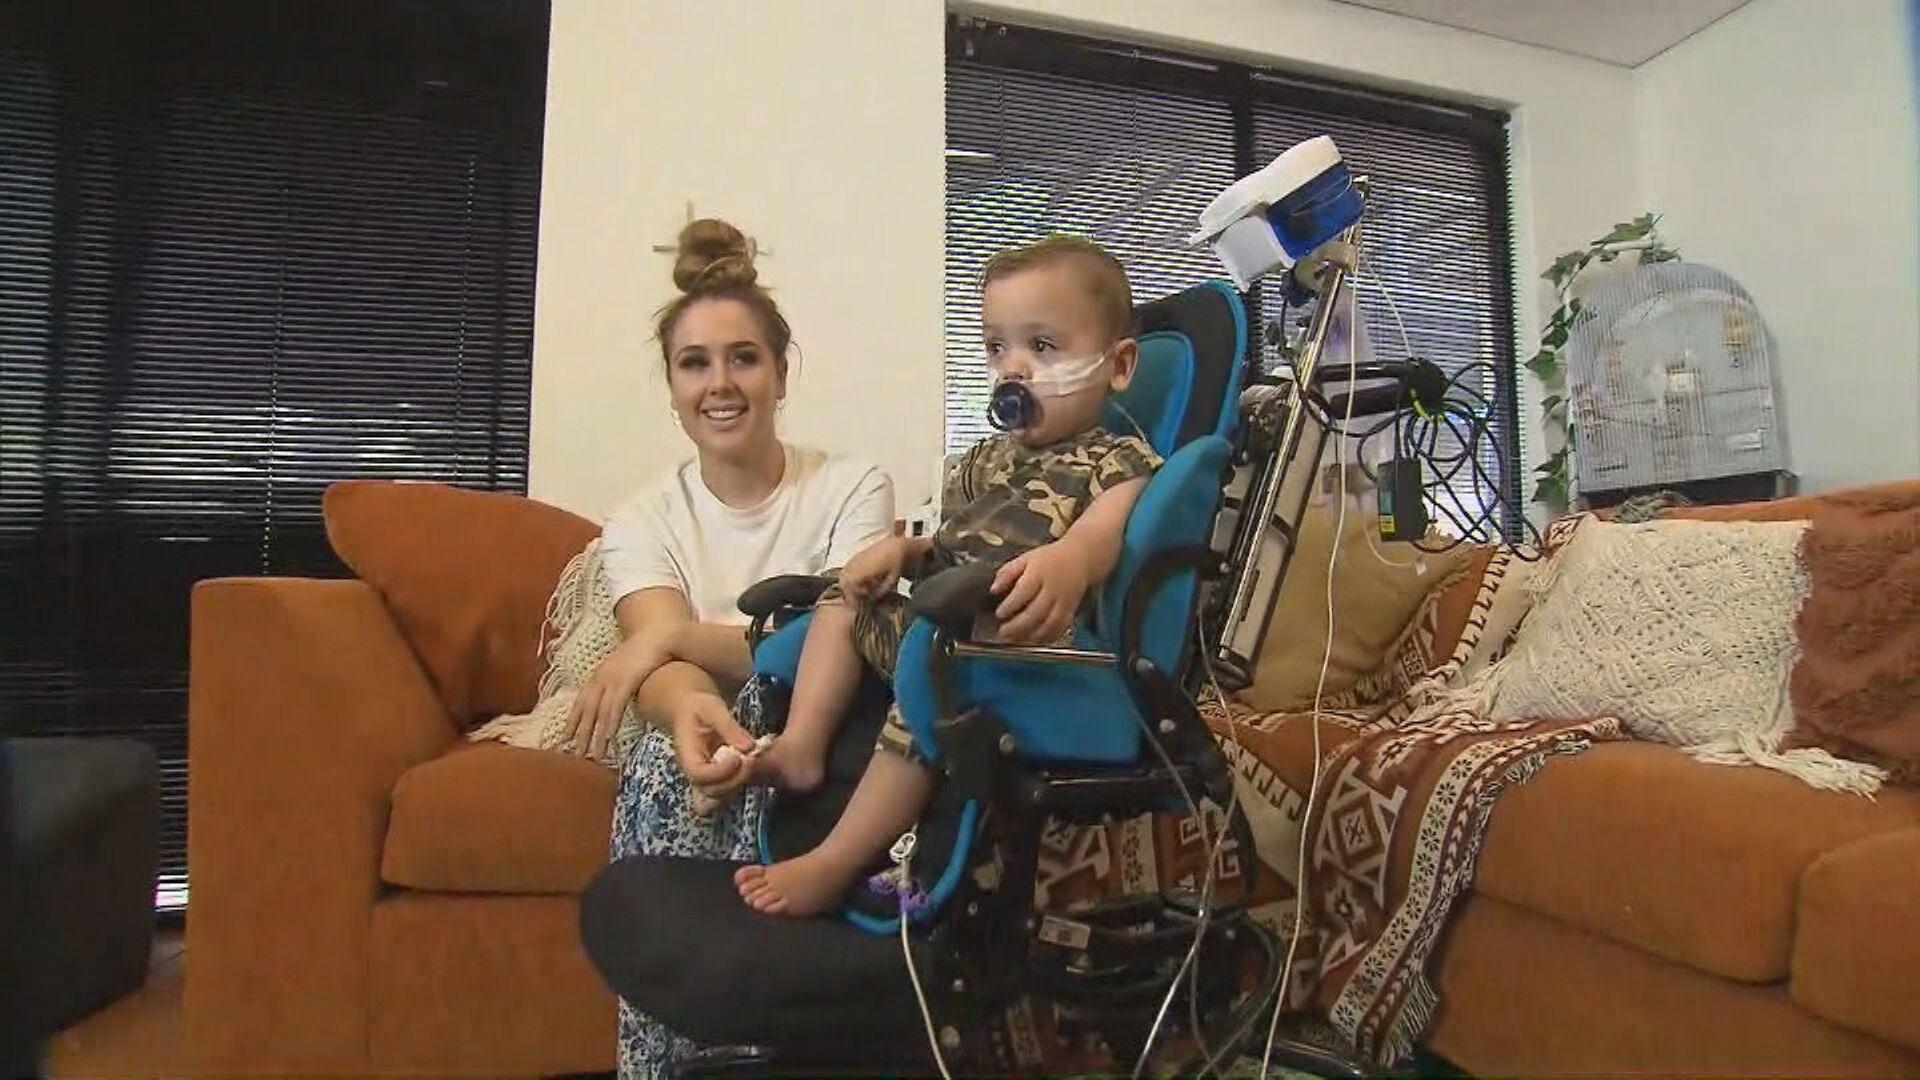 Heartless thief steals lifesaving oxygen from sick baby boy